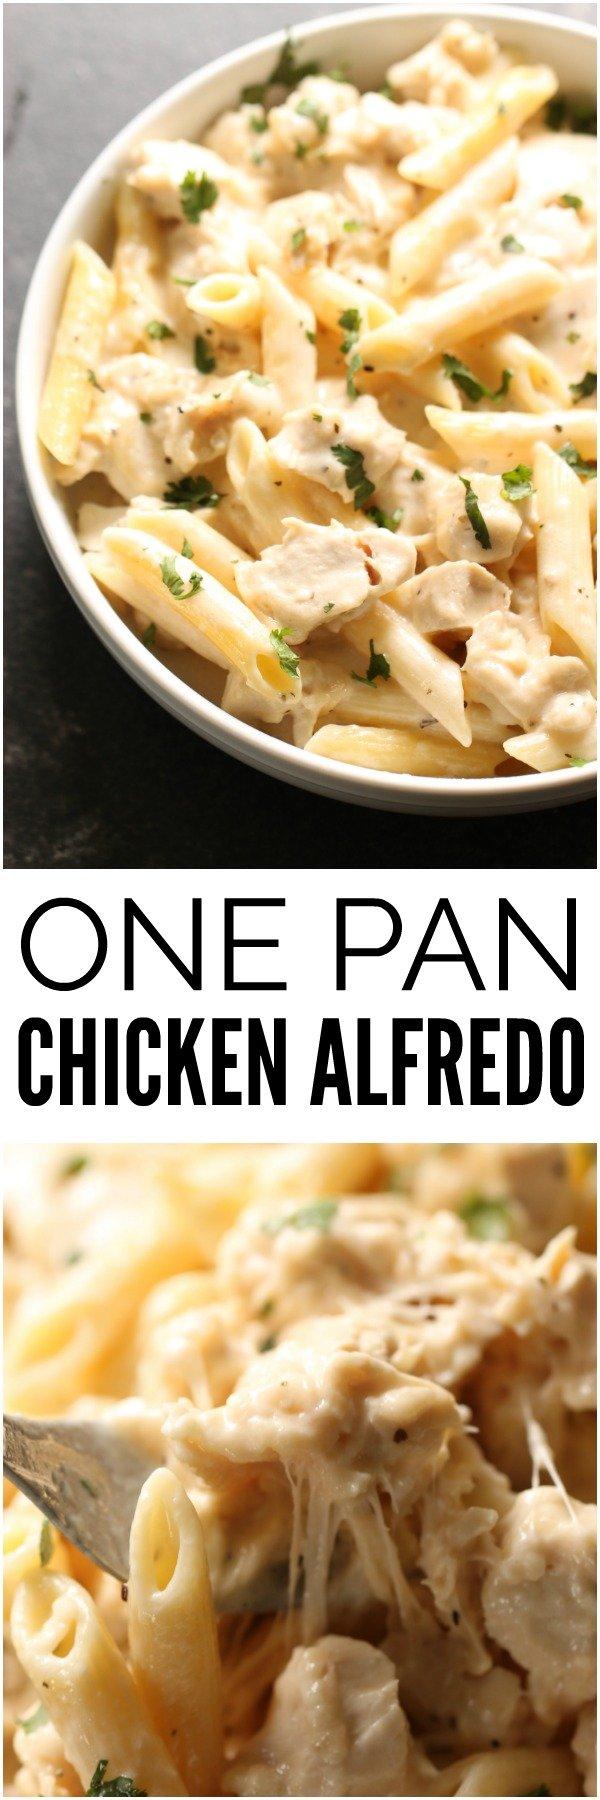 One Pan Chicken Alfredo